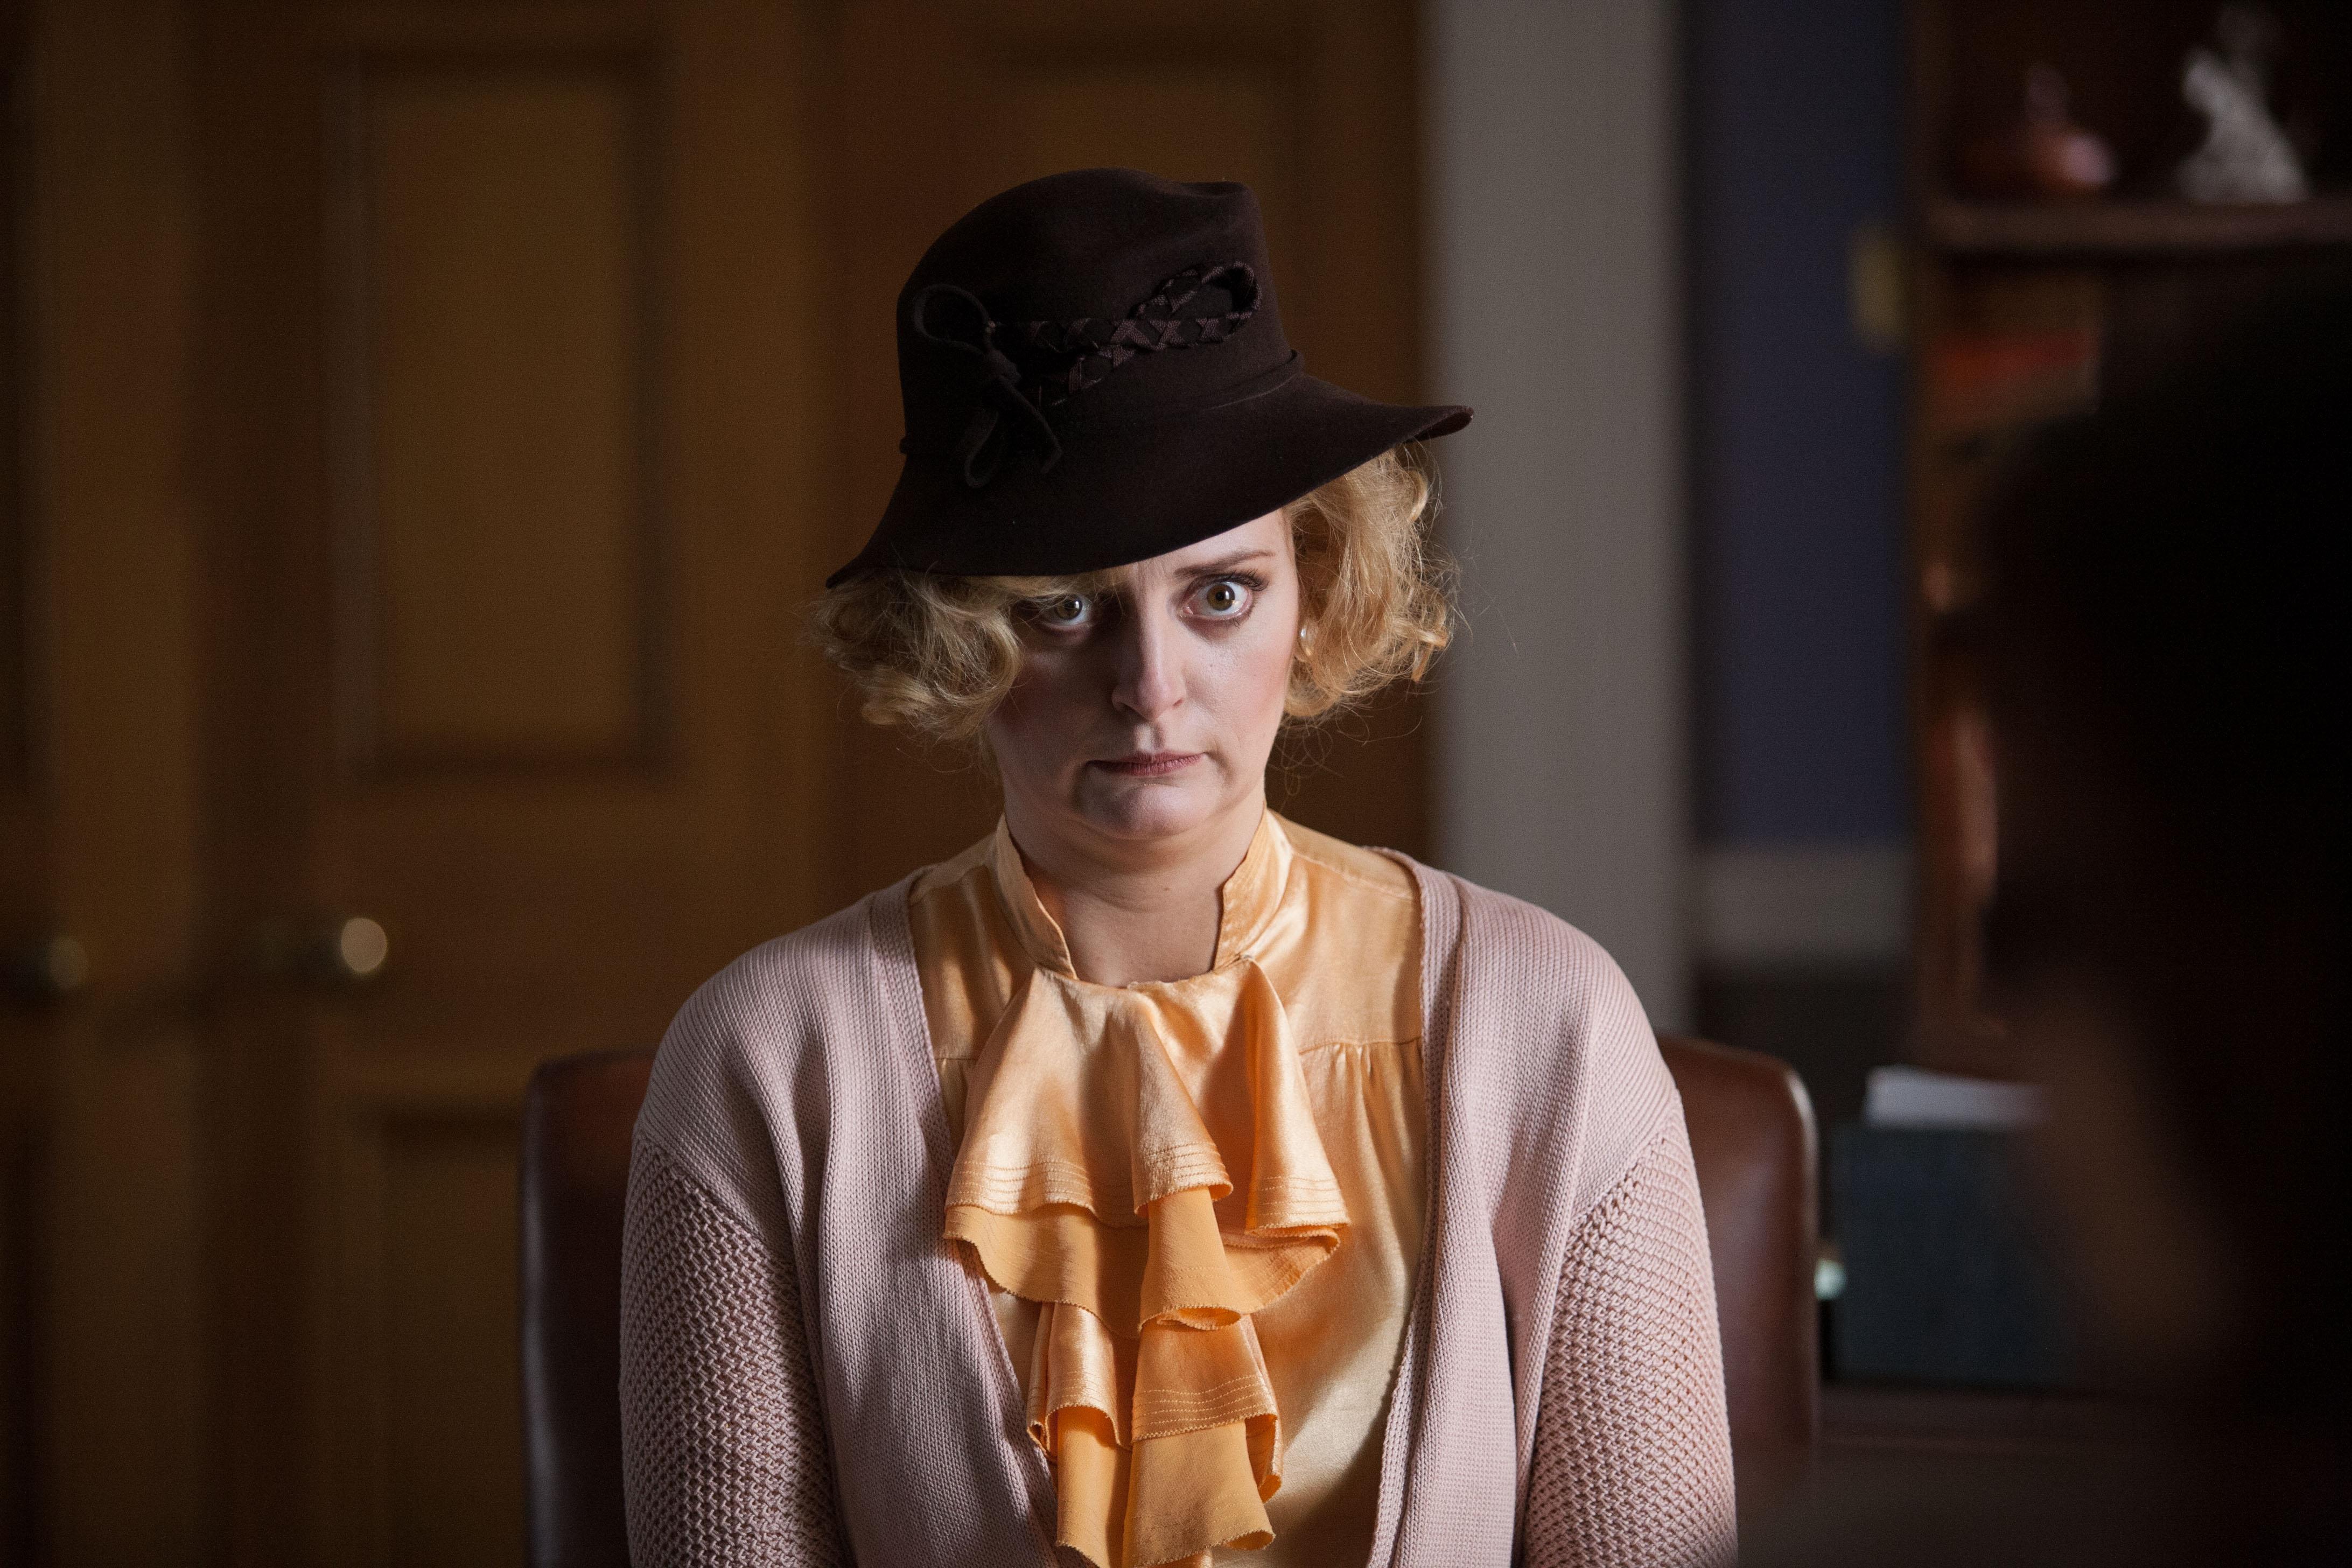 Psychobitches, Series 02, Episode 06, Morgana Robinson as Daphne duMaurier